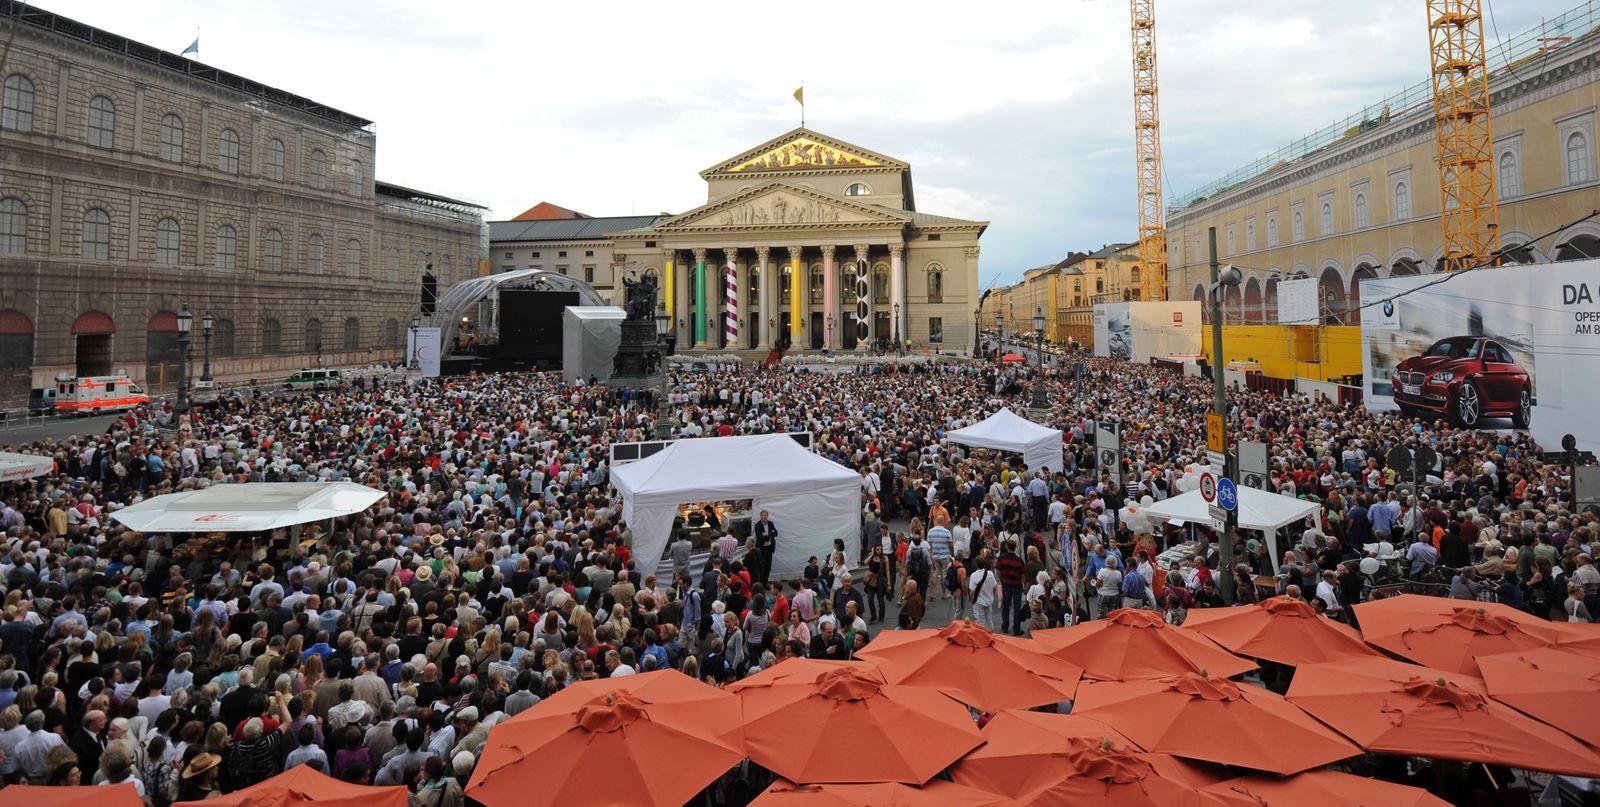 Münchner Opernfestspiele 2011